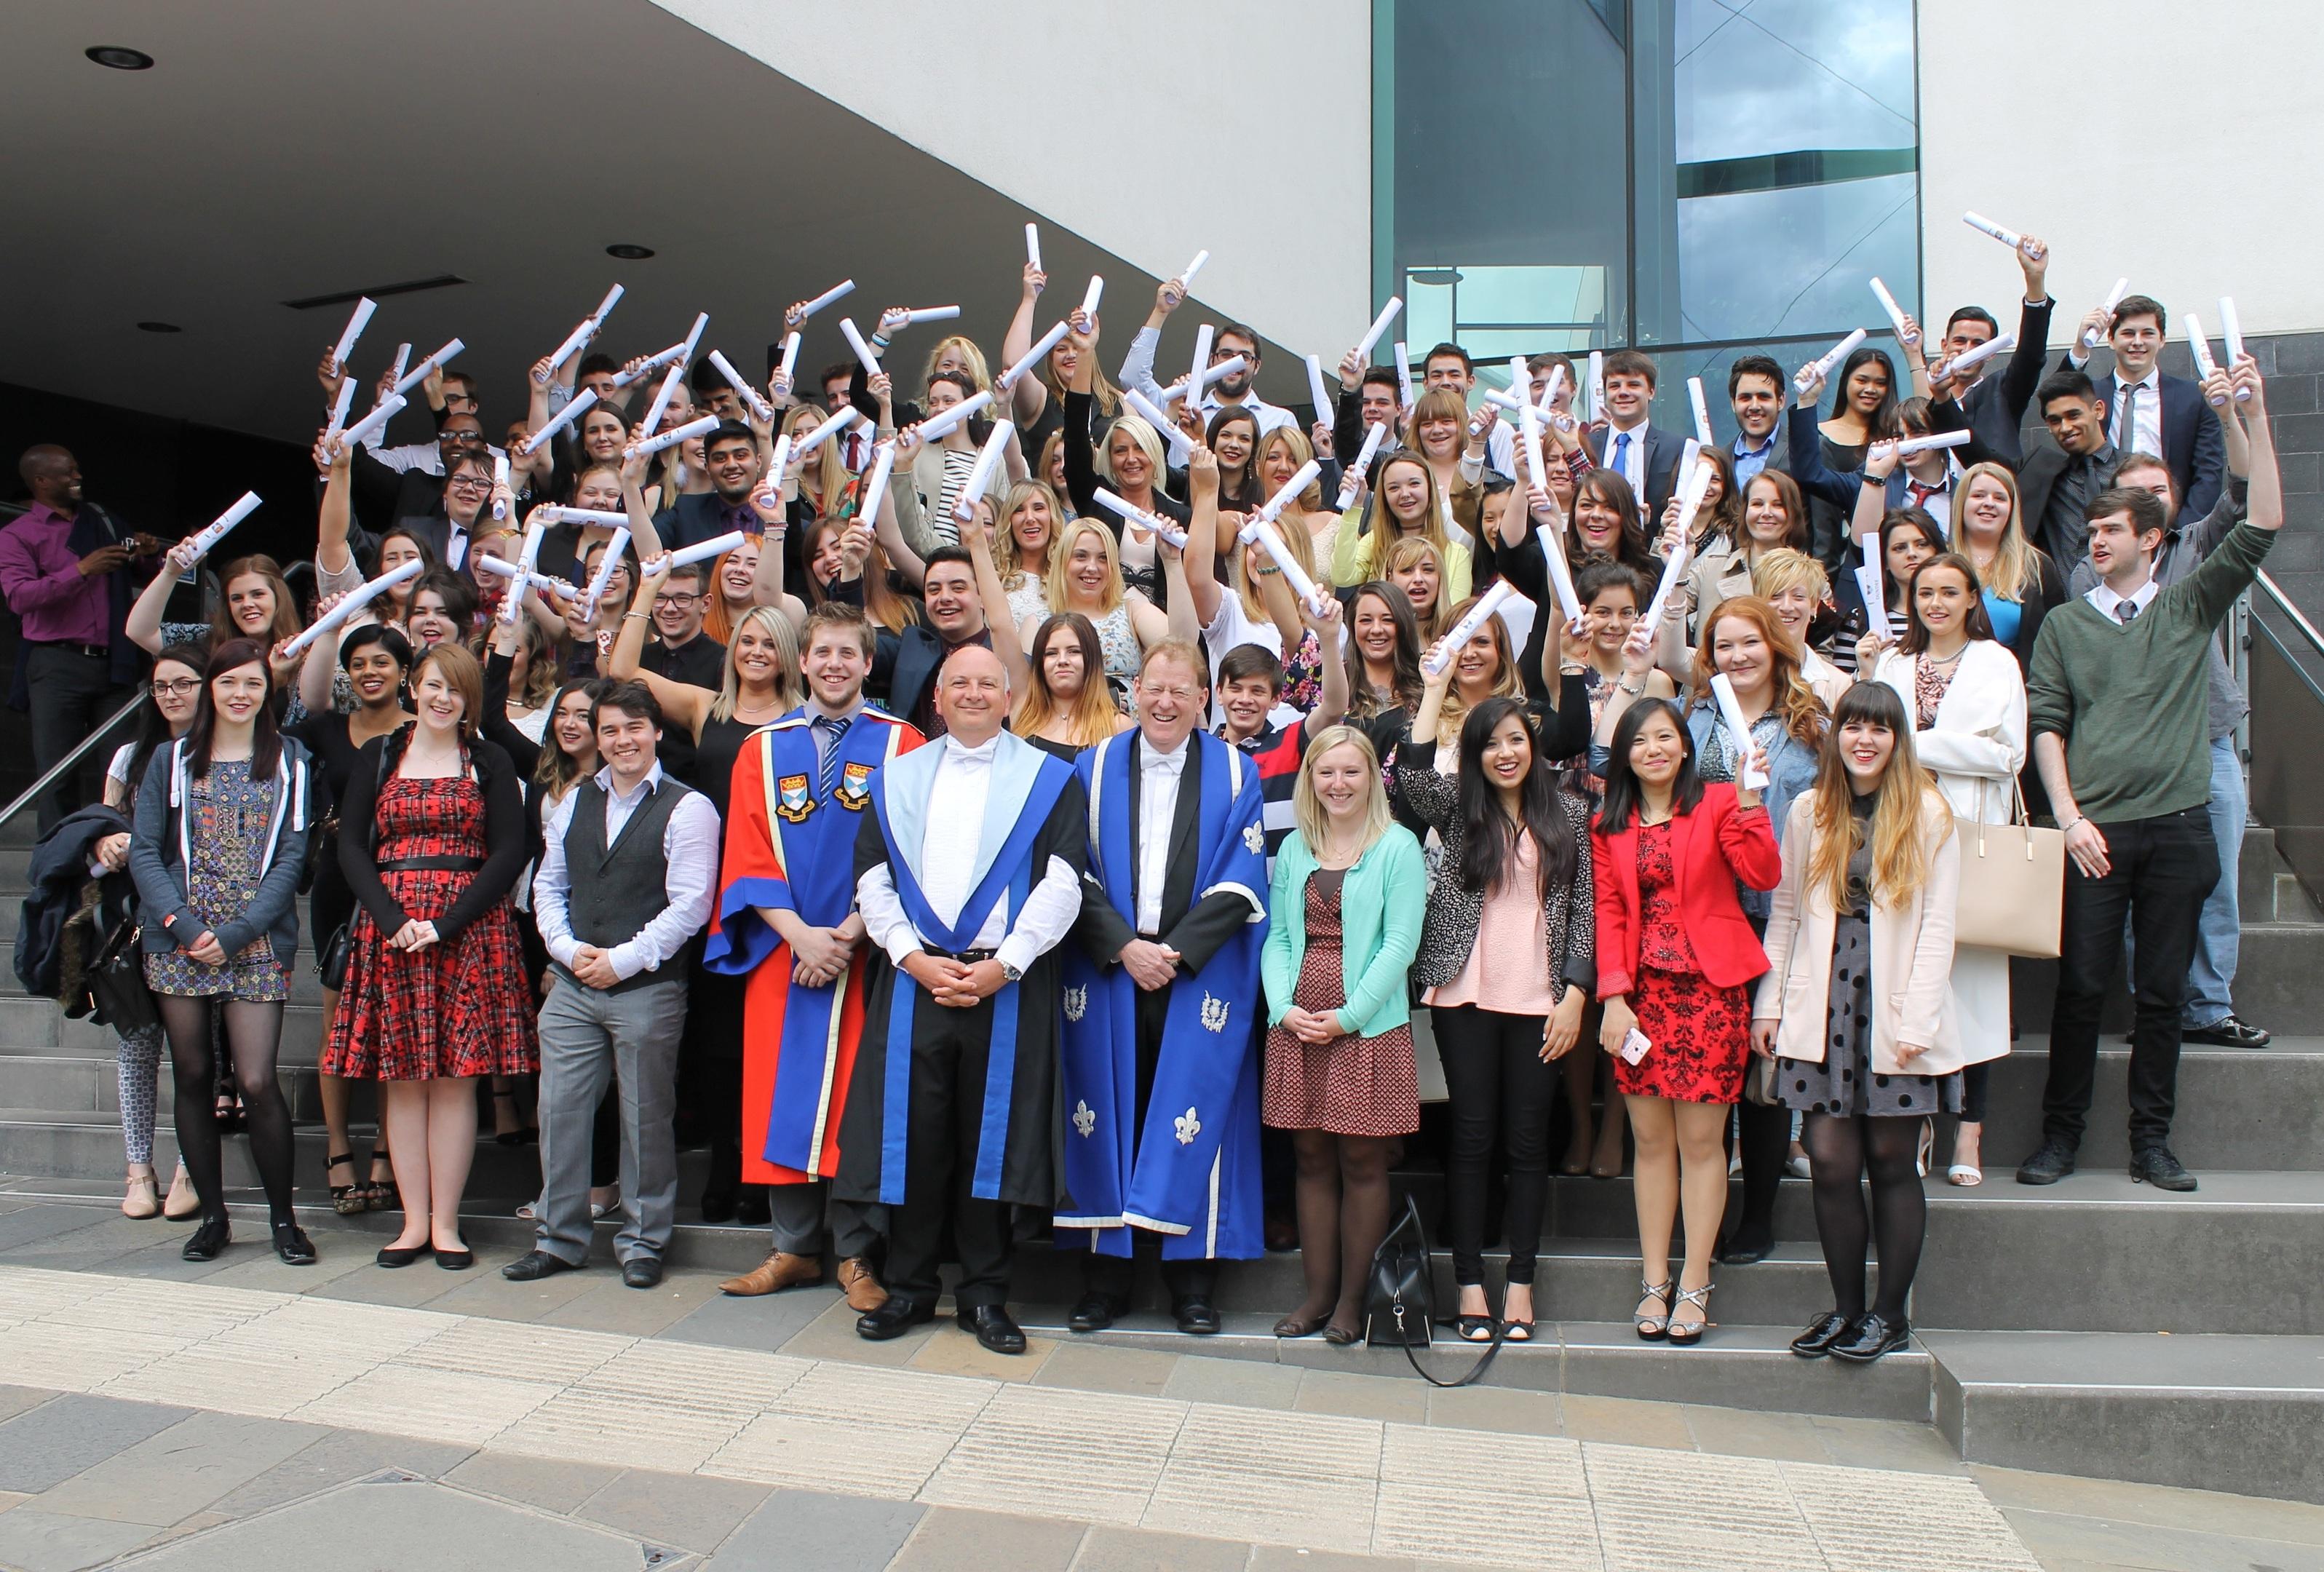 Last year's graduates of the Dundee University summer school programme